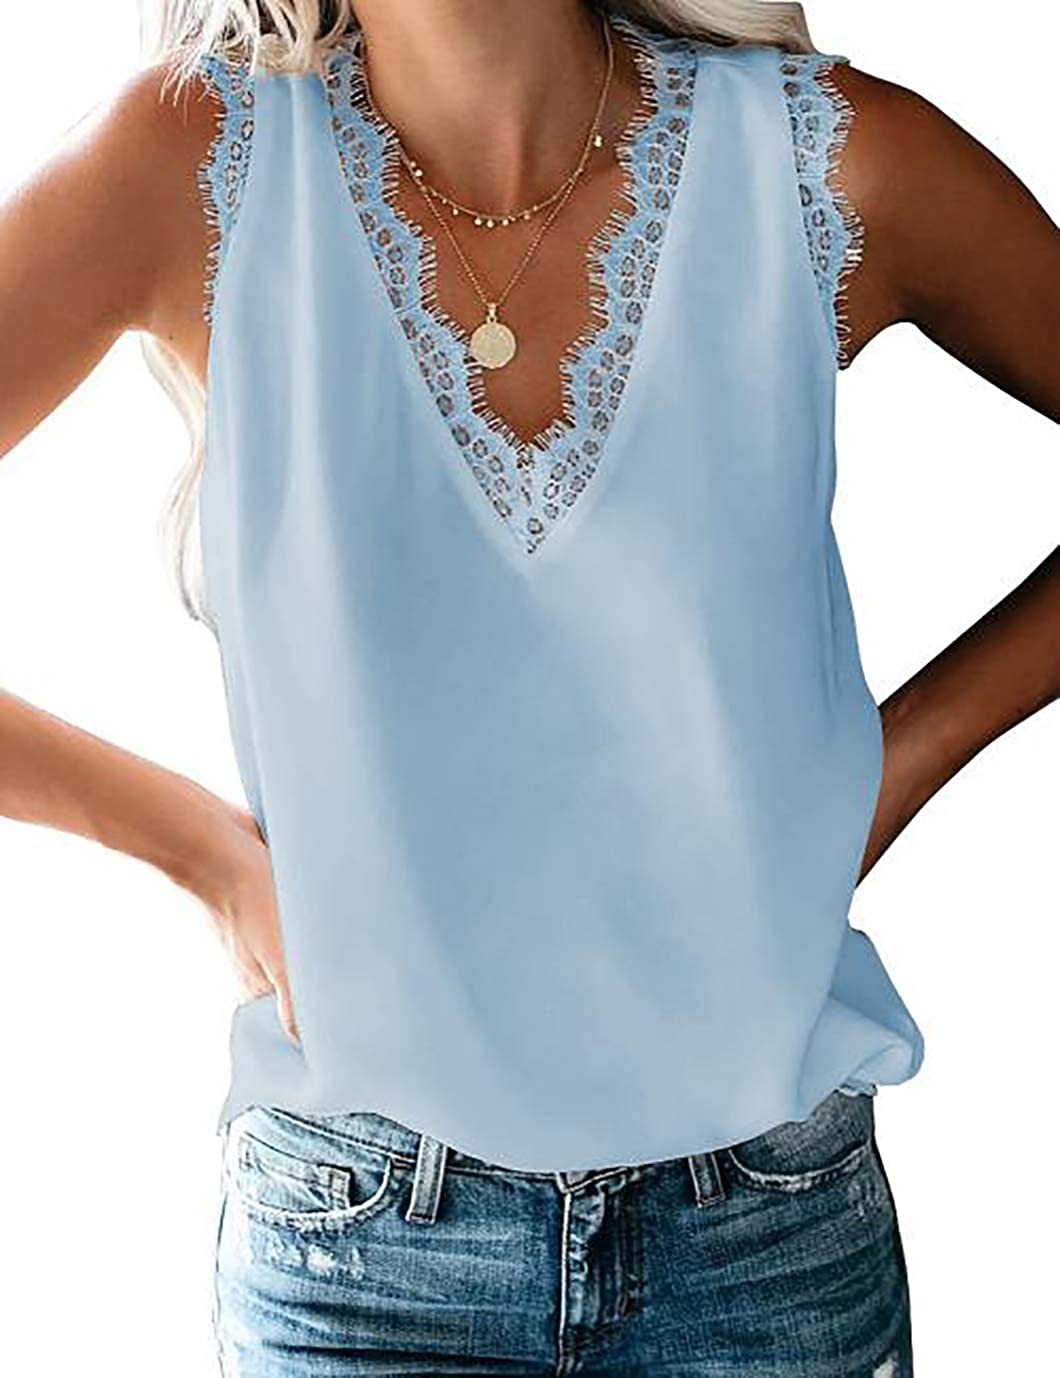 Eddoyee Women Fashion Cami Tank Tops V Neck Sleeveless Blouse Loose Casual Shirts Summer